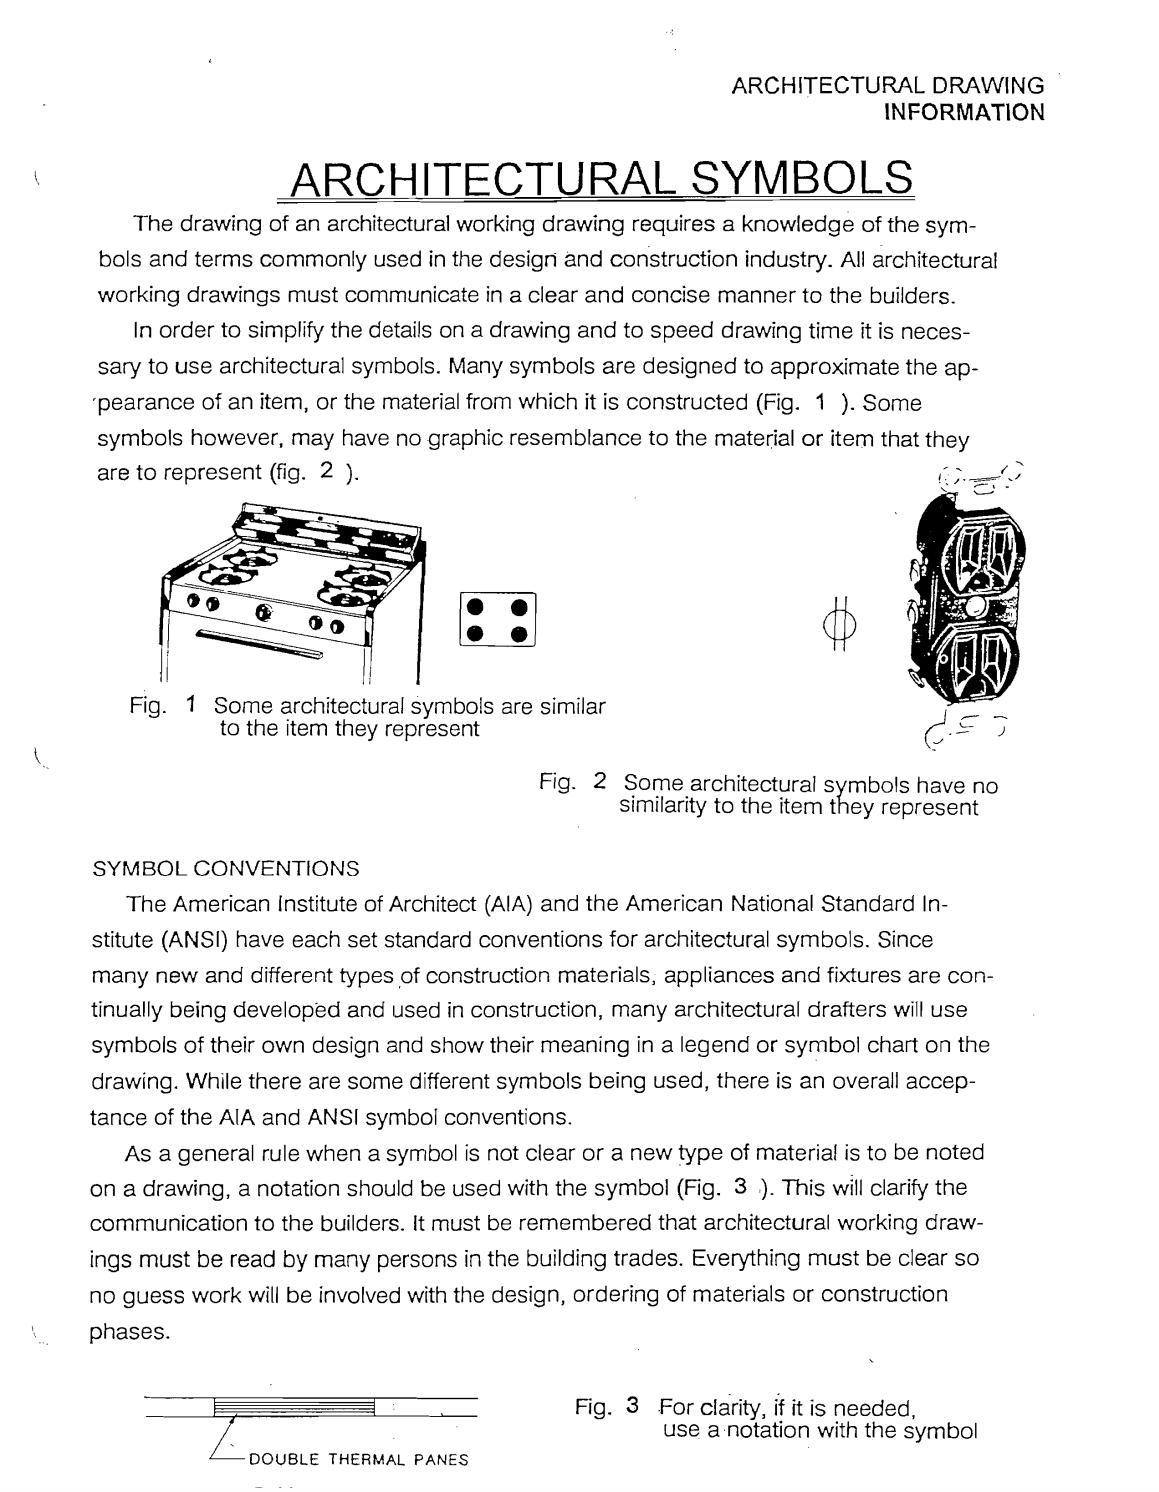 Architectural Symbols Packet By Bhavik Pithadiya Issuu